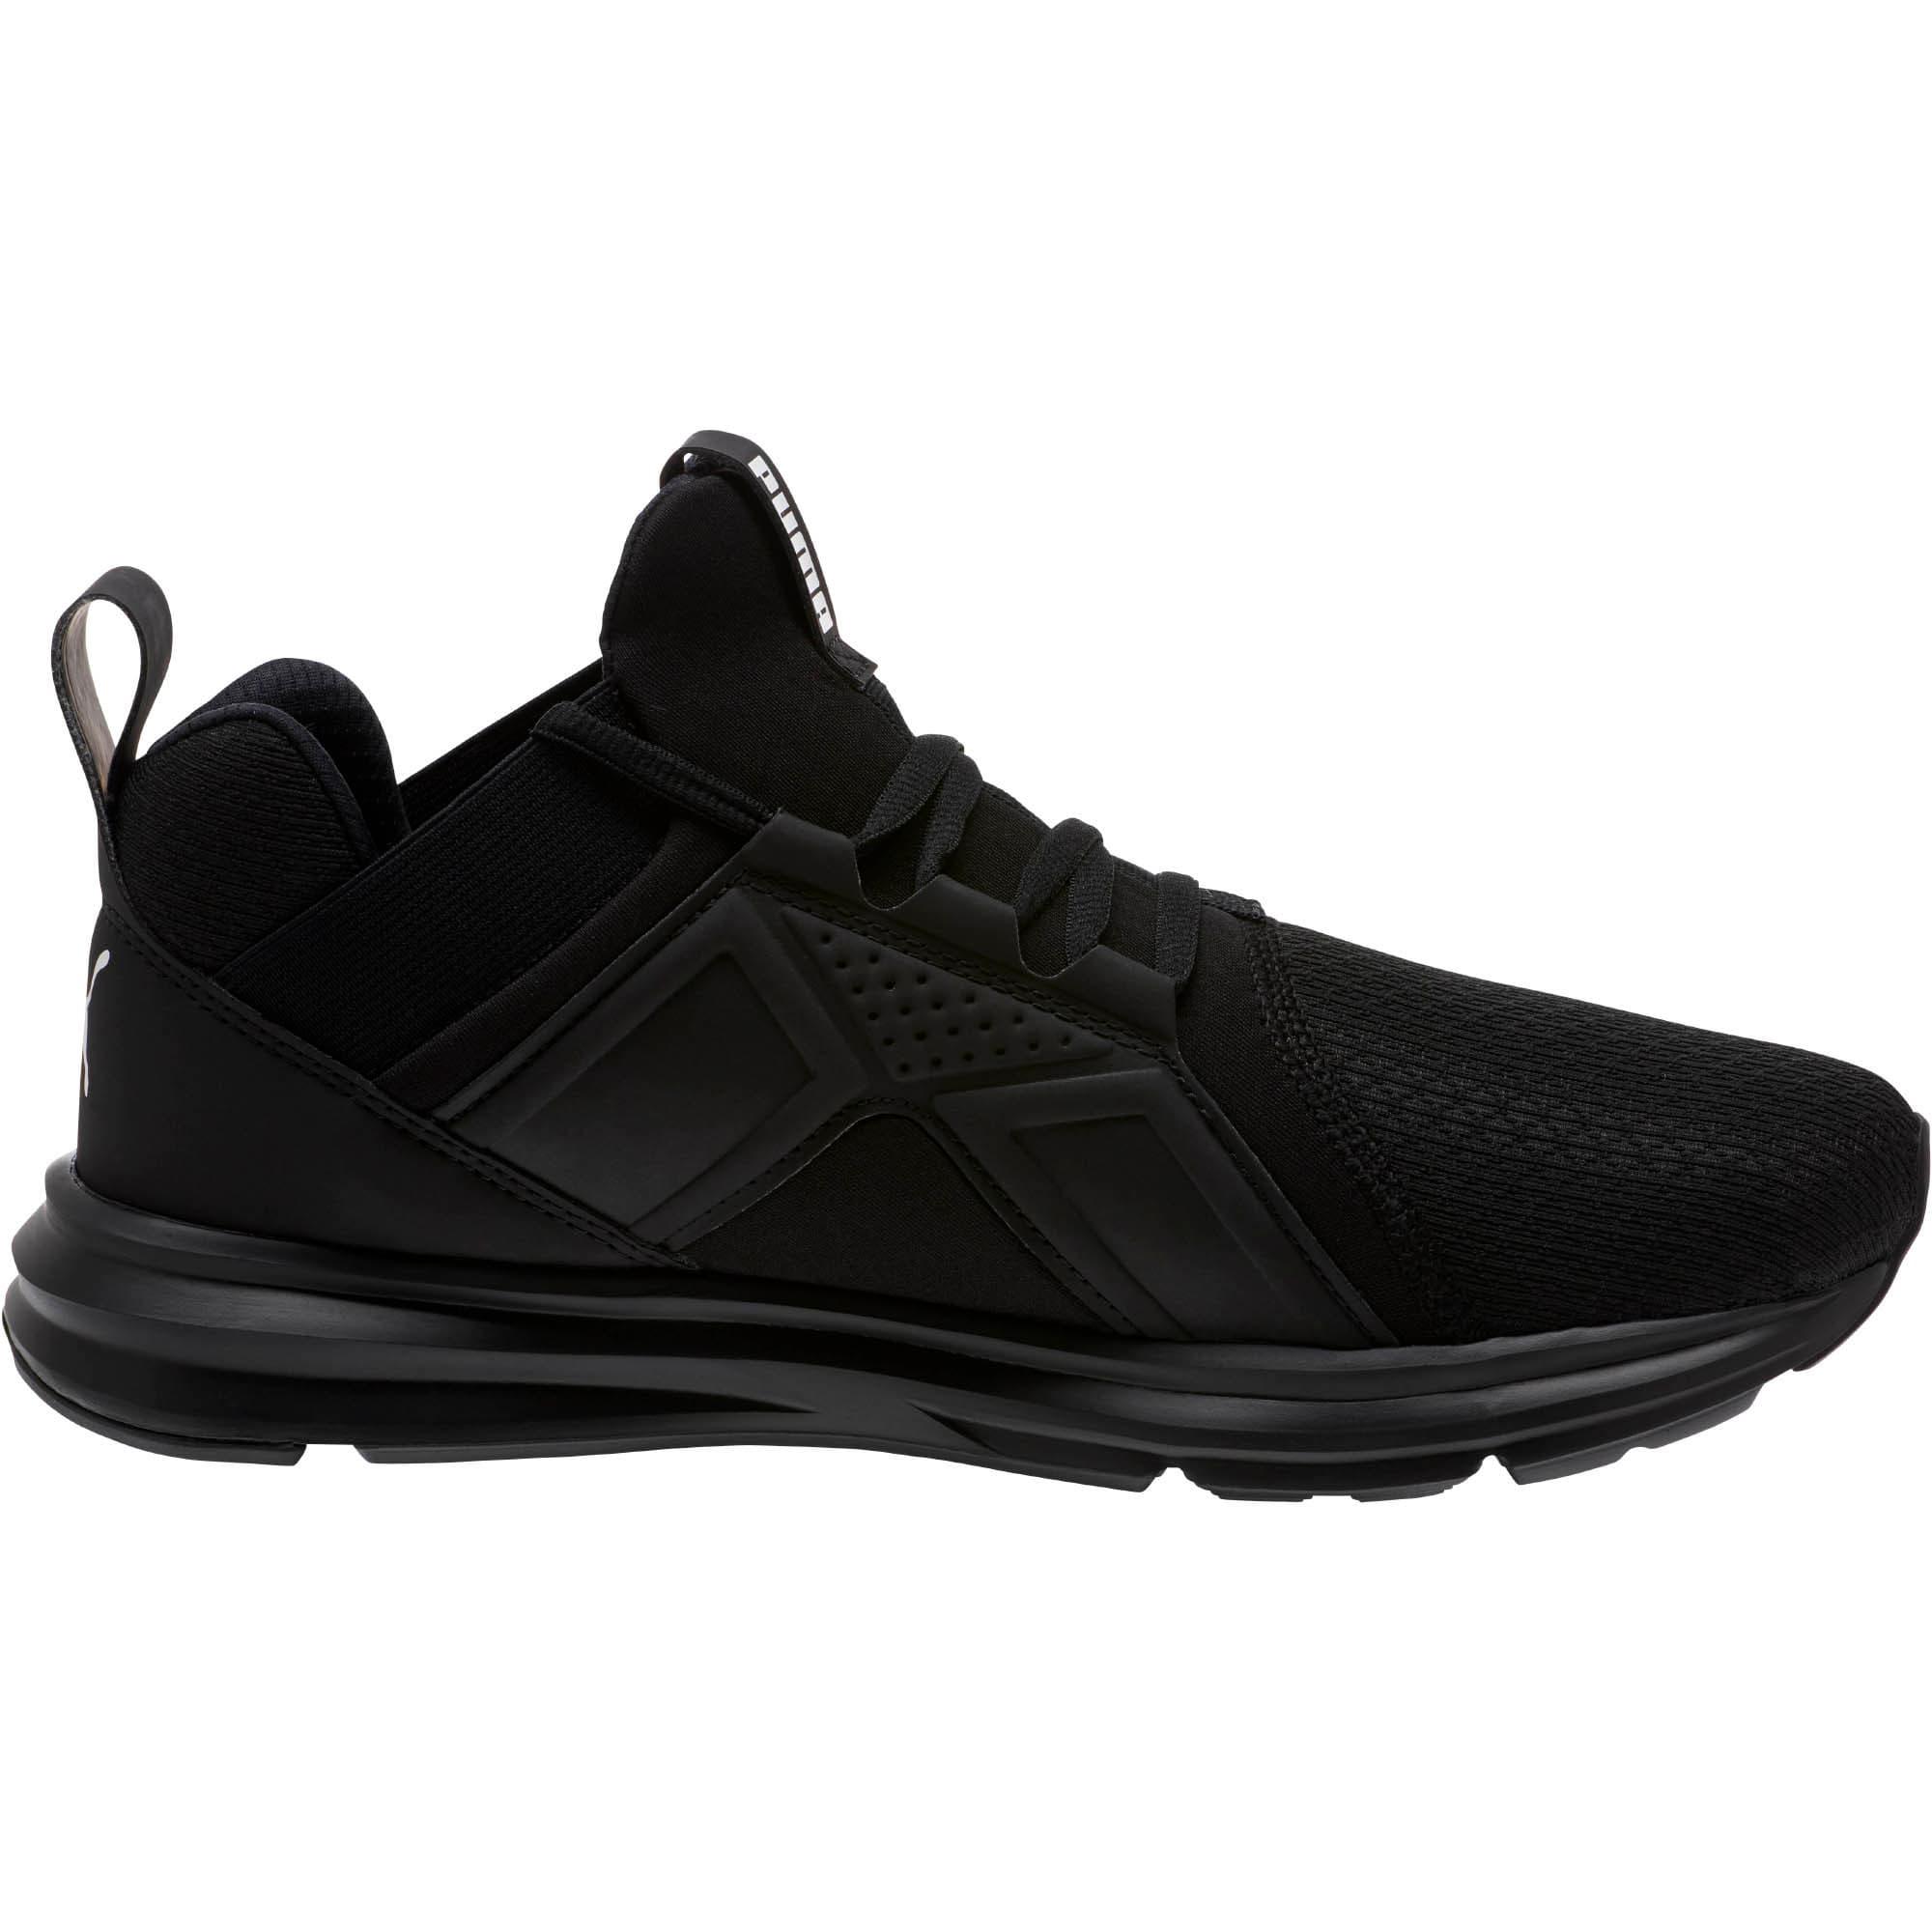 Details about PUMA Enzo Men's Training Shoes Men Shoe Running